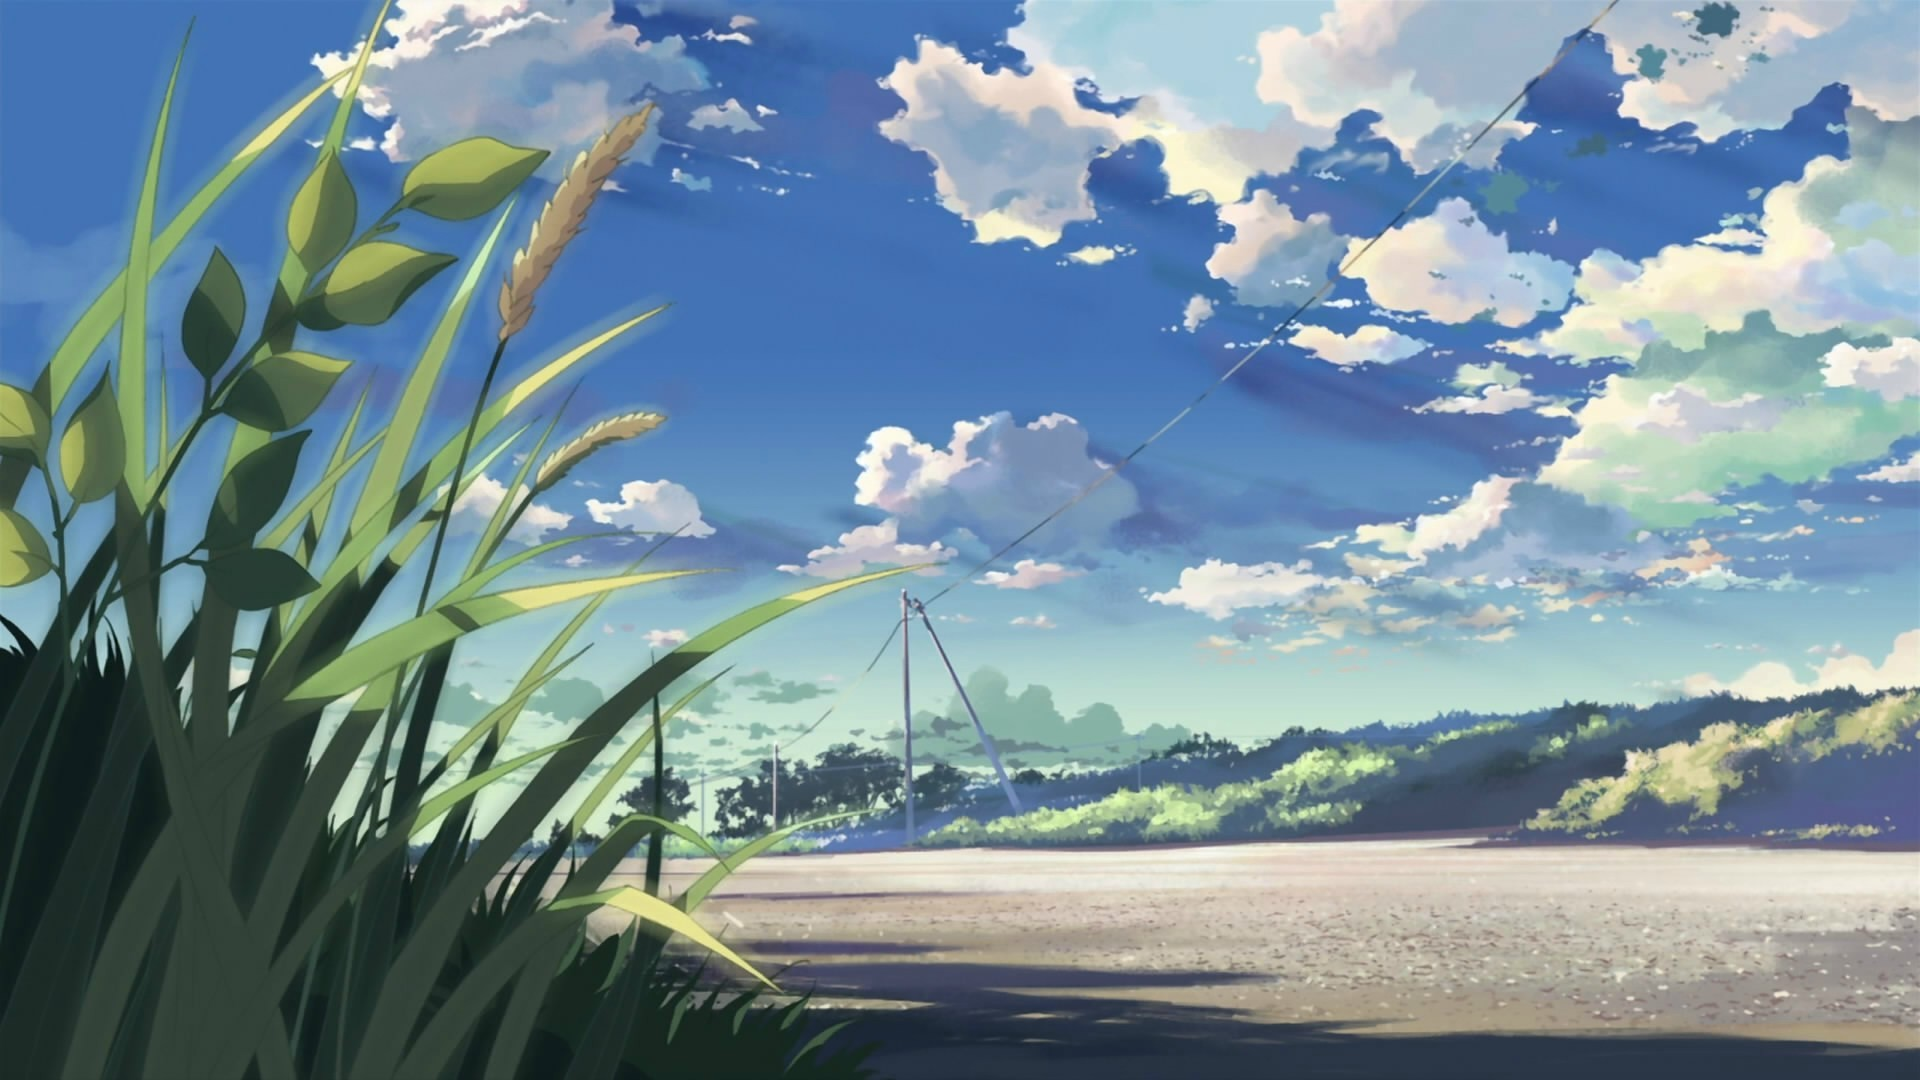 anime scenery wallpaper 7976